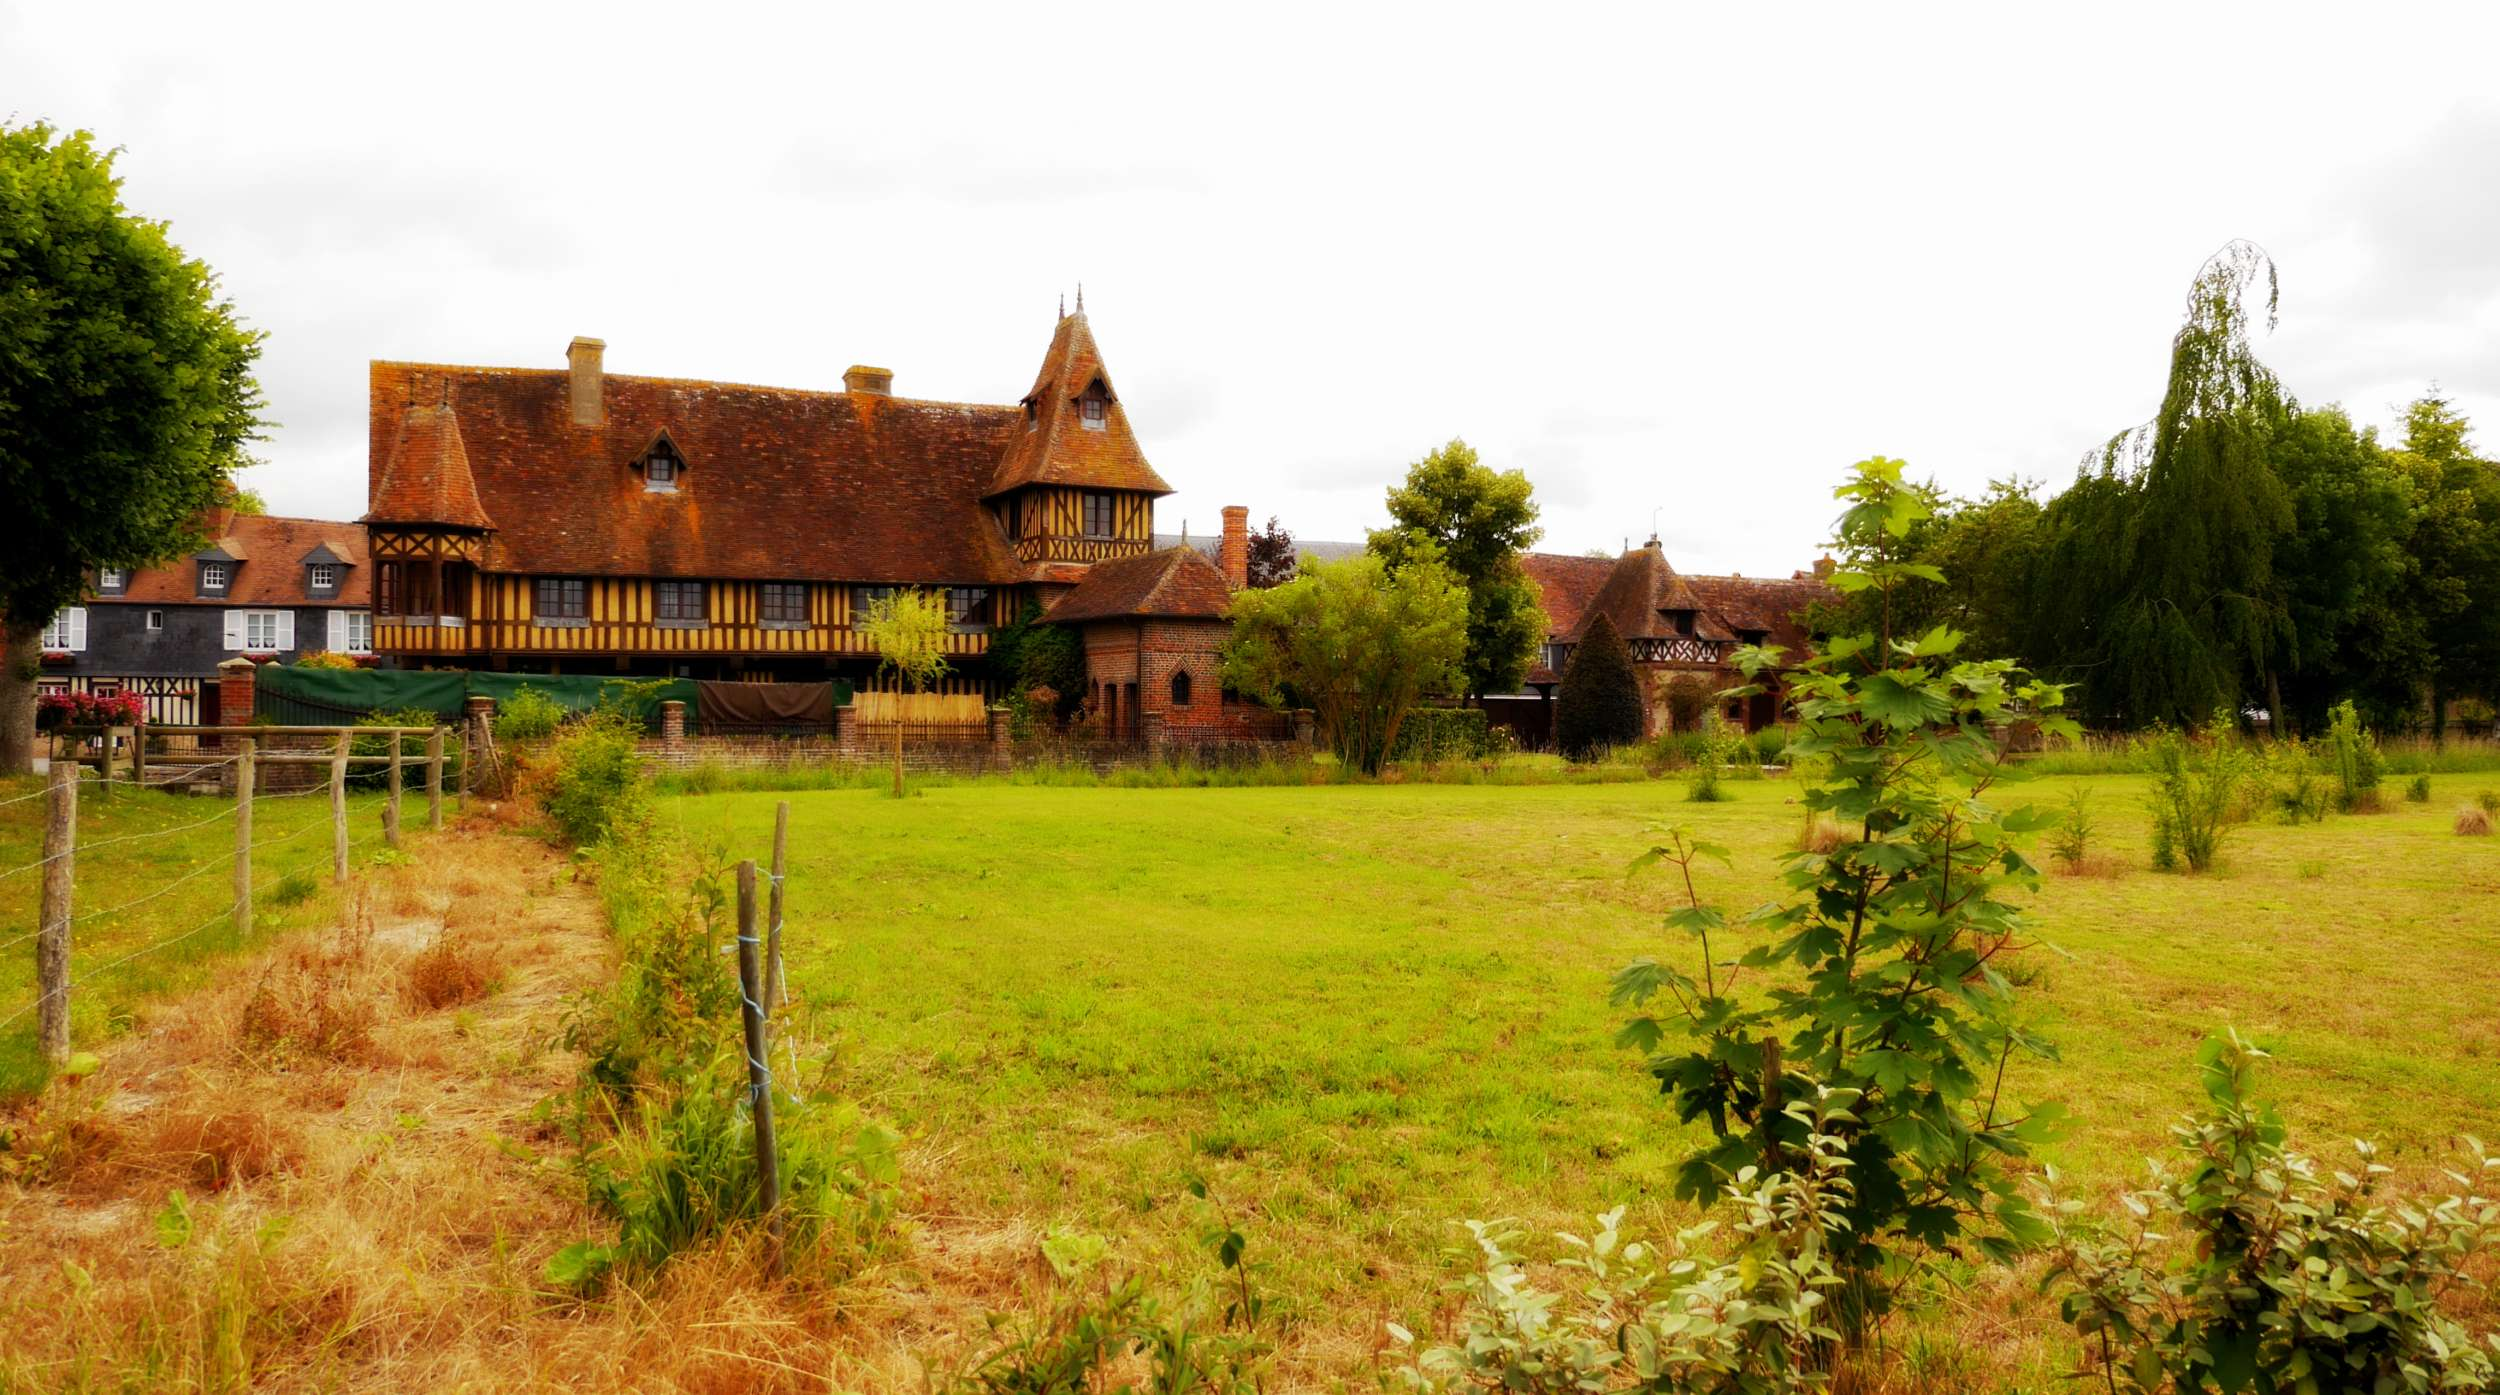 Haus in Beuvron-en-Auge in Frankreich